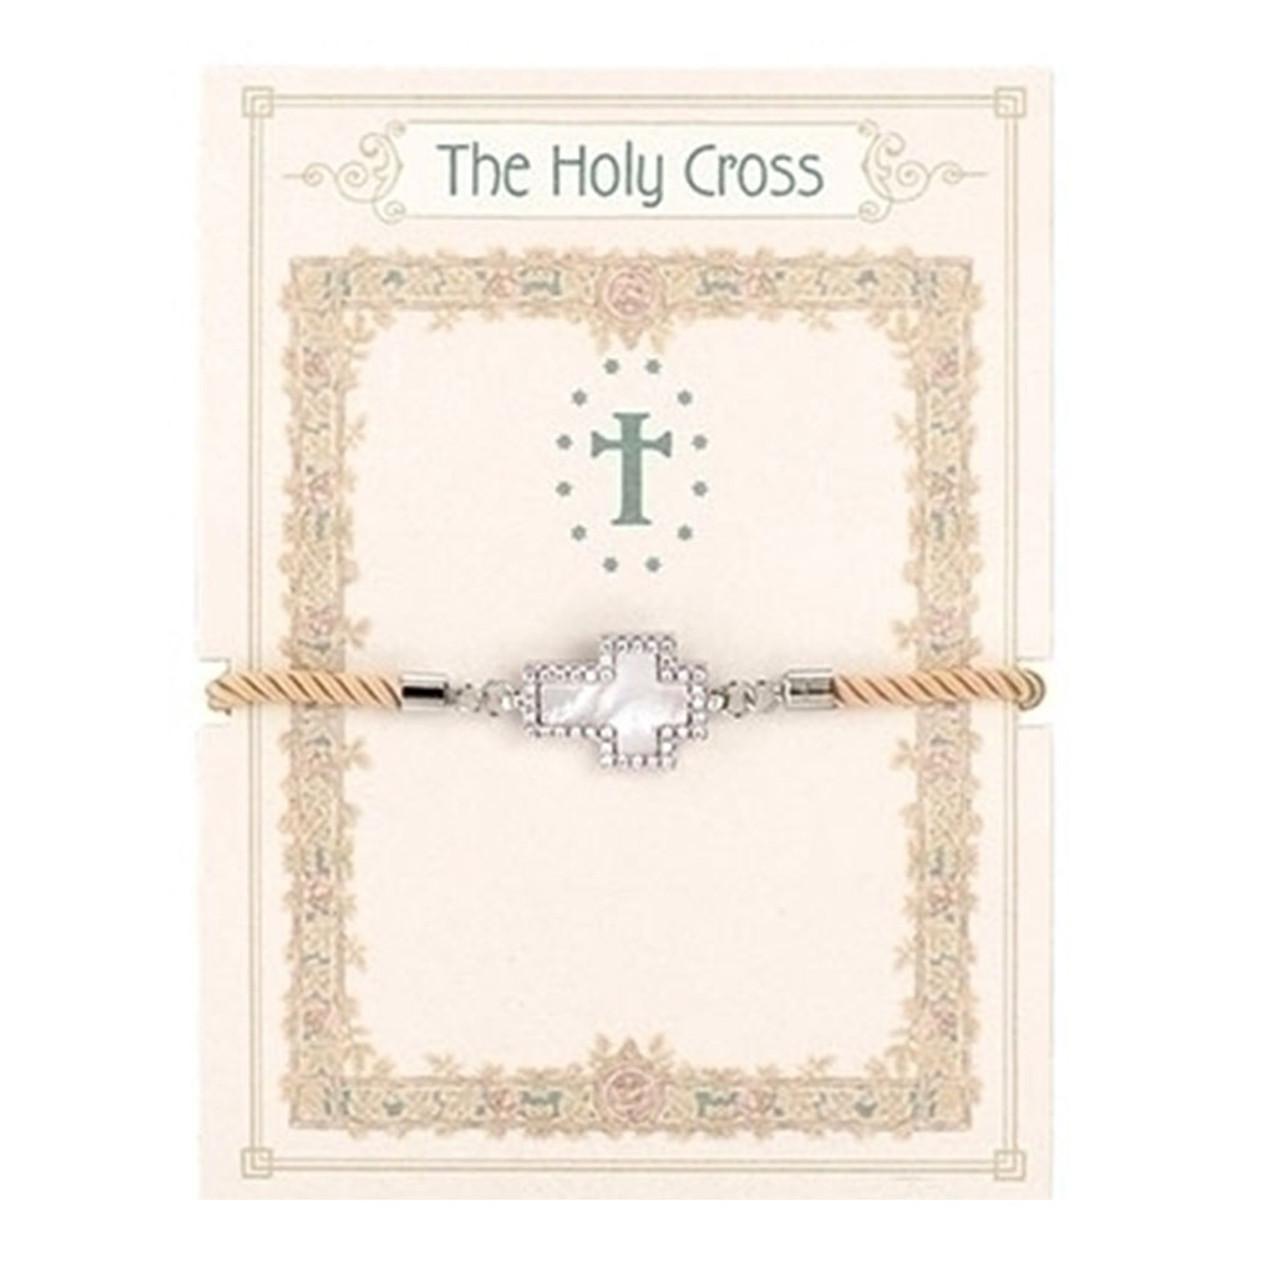 Cross Bracelets 6 Asst - Sold Separately